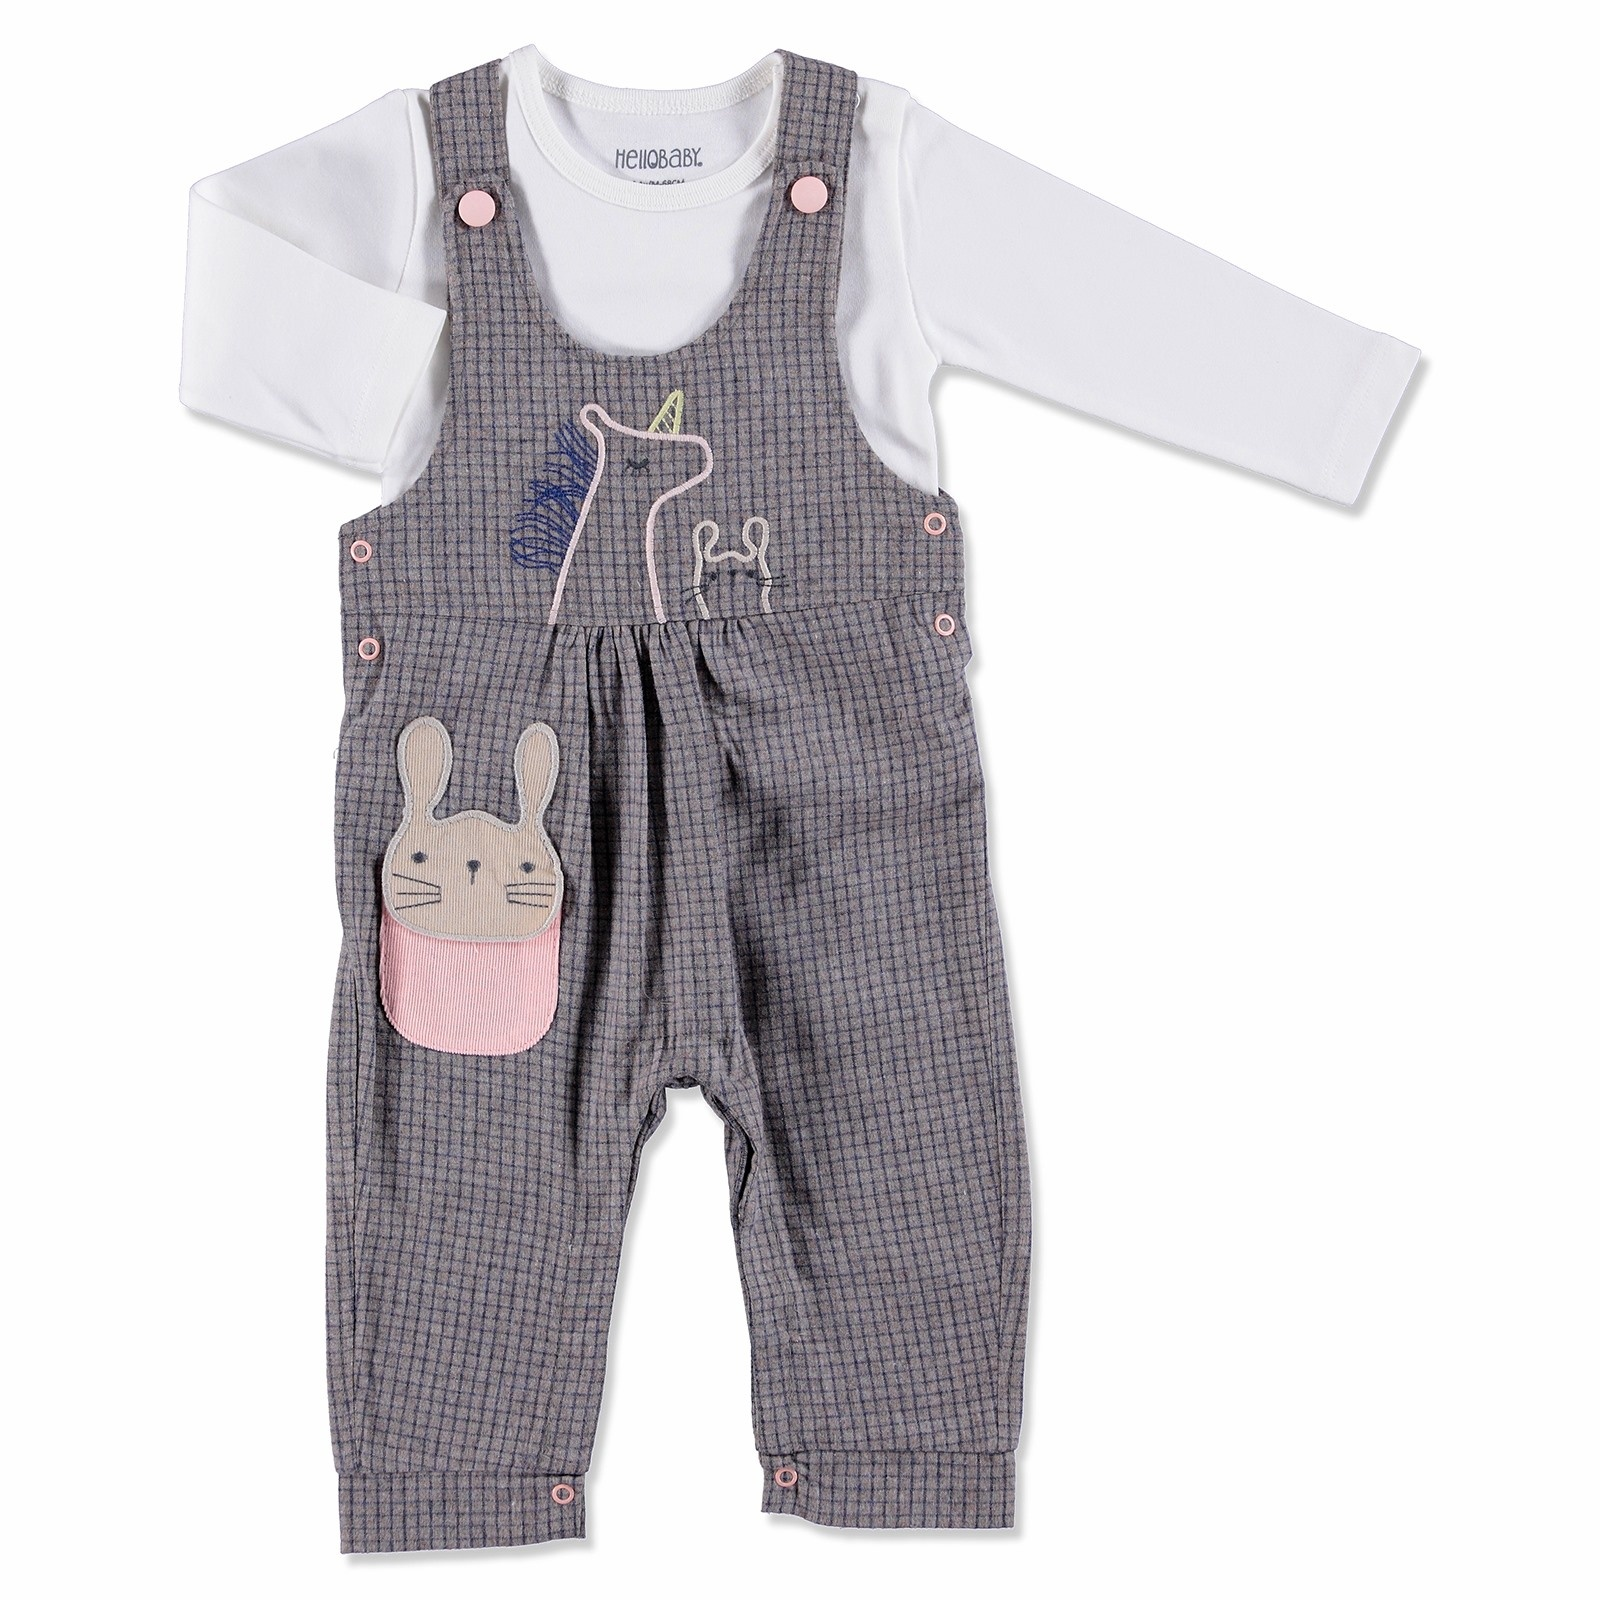 Ebebek HelloBaby Rabbit Texture Baby Dungarees Sweatshirt Set